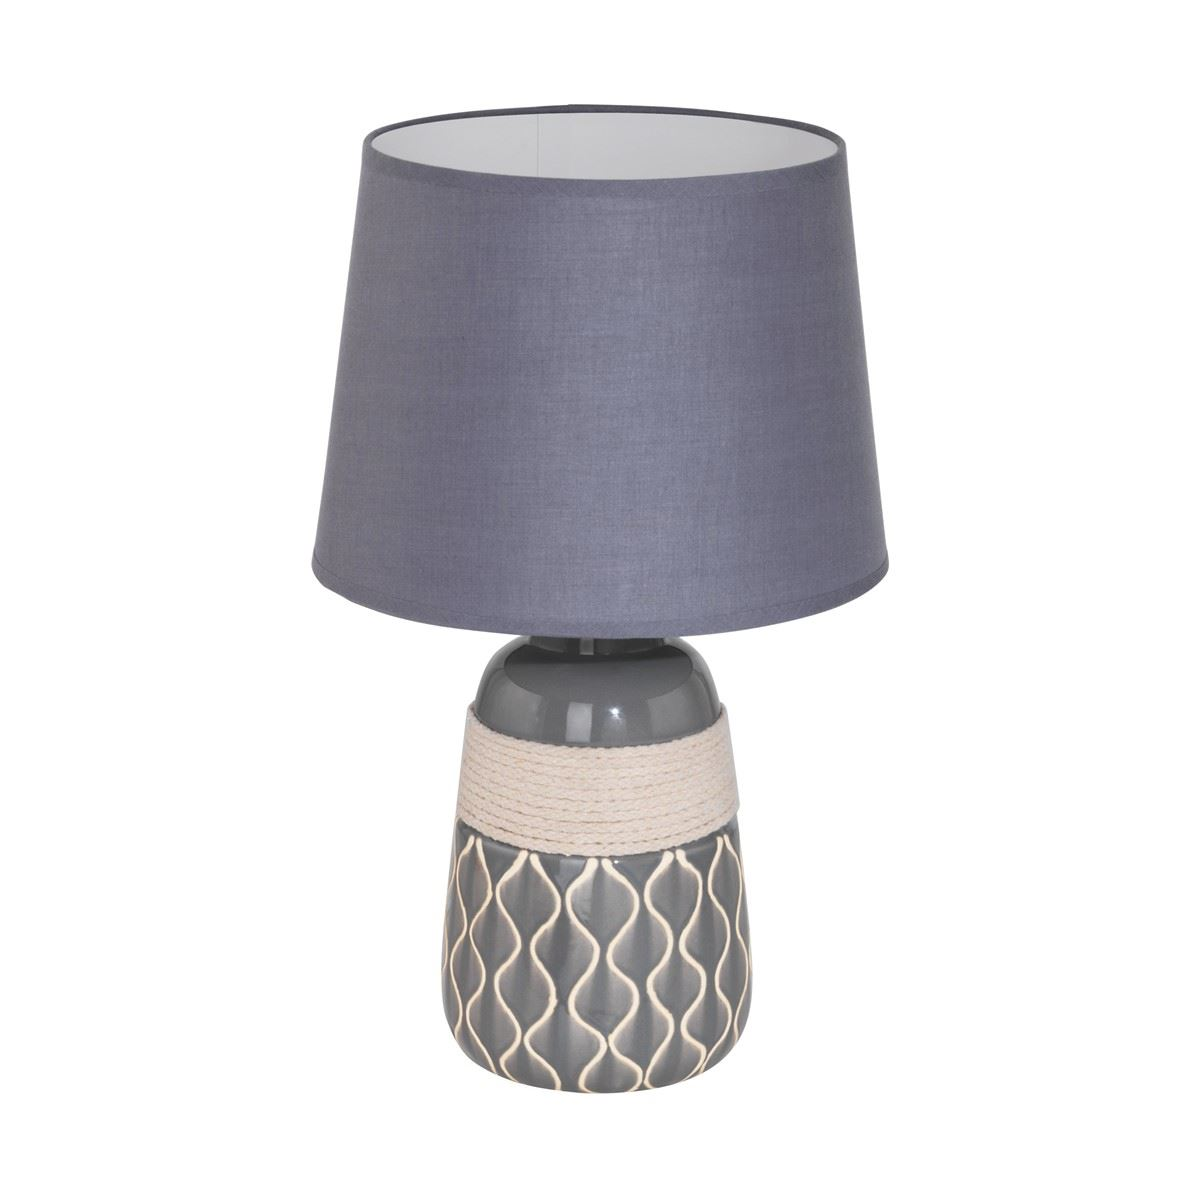 Bellariva Beige Ceramic Modern Table Lamp With Grey Shade